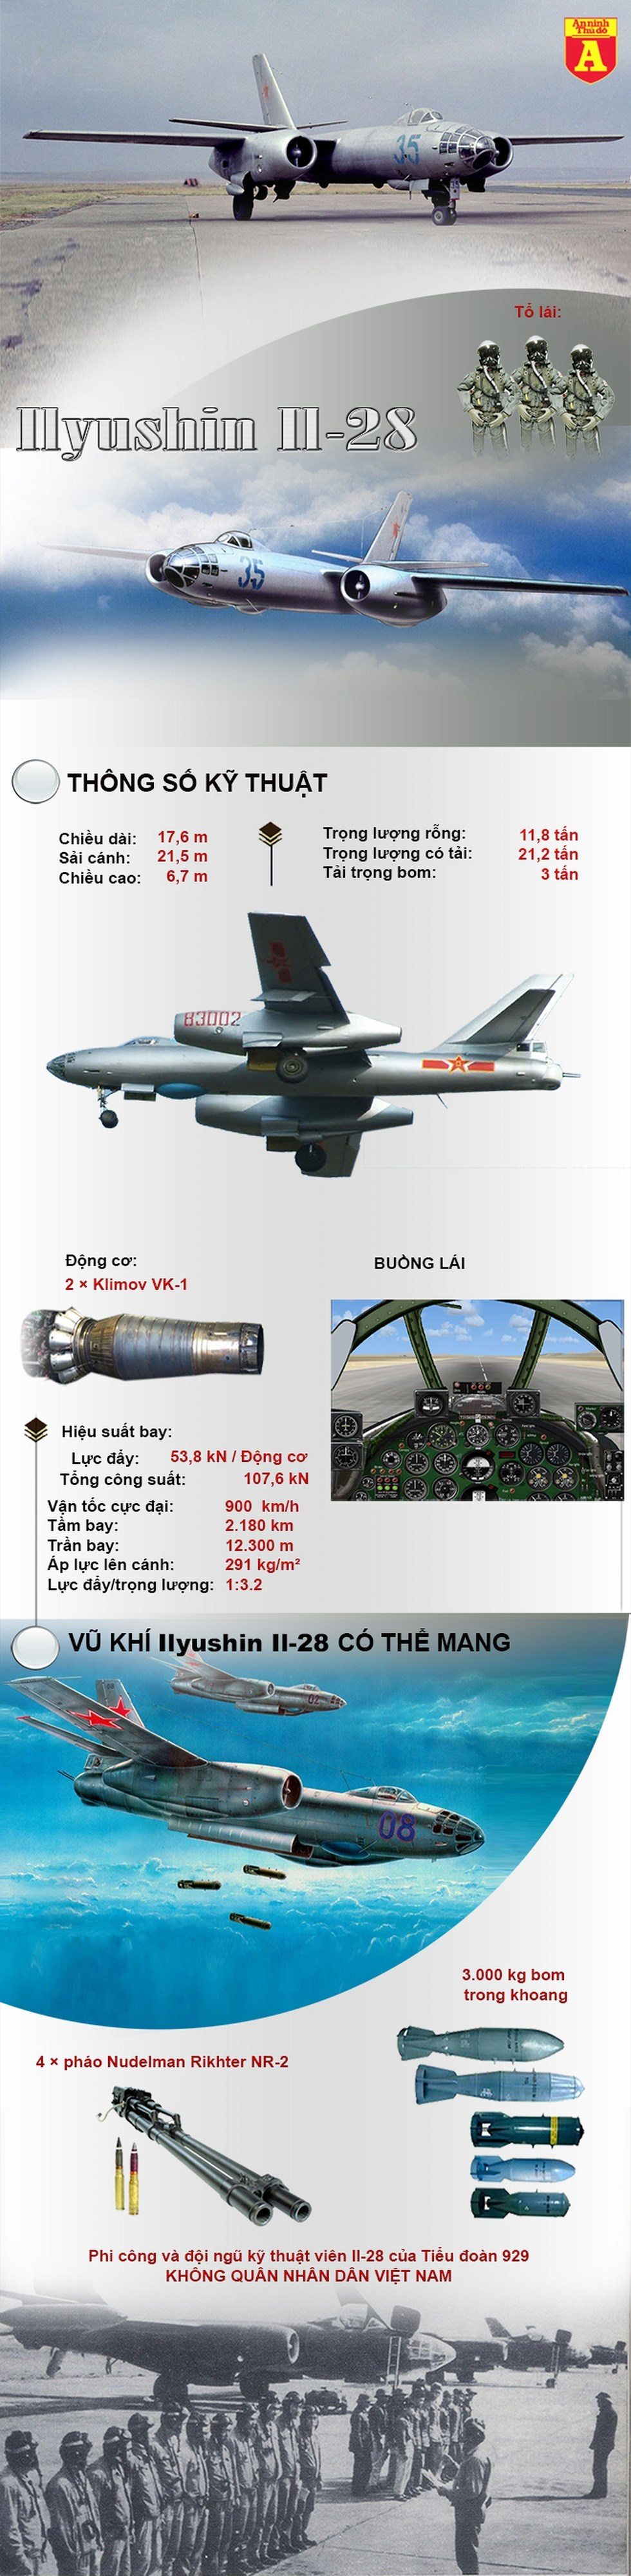 máy bay ném bom,máy bay